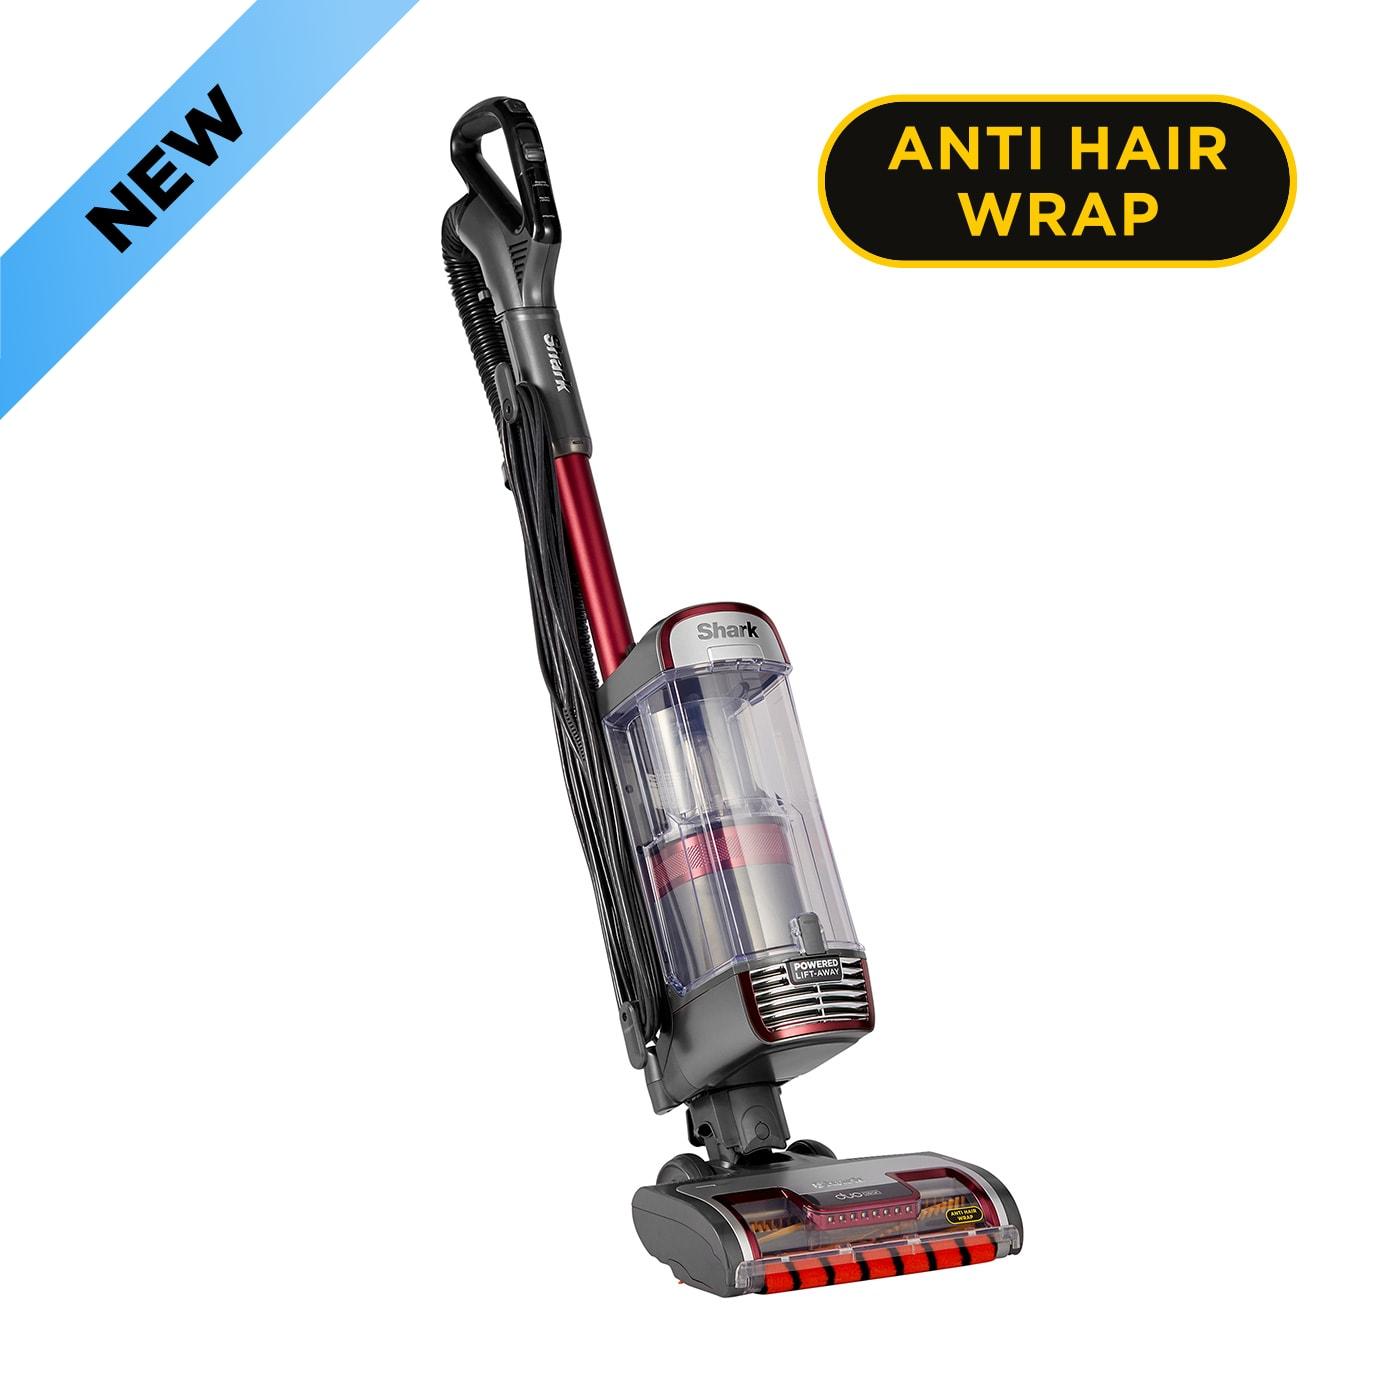 Shark Anti Hair Wrap Upright Vacuum Cleaner Plus with Powered Lift-Away AZ912UK product photo